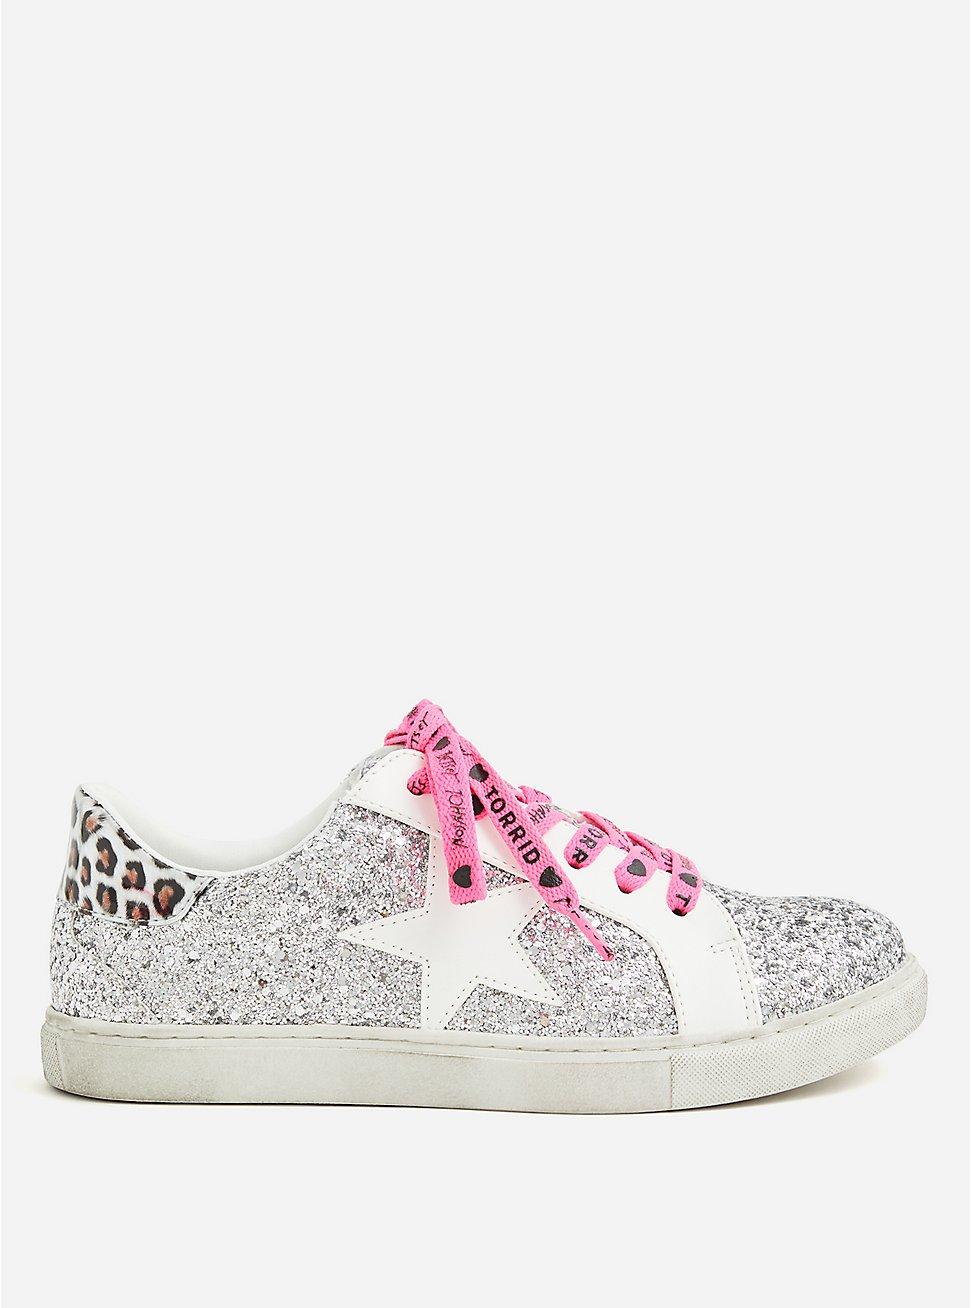 Plus Size Betsey Johnson Silver Glitter Distressed Sneaker (WW), SILVER, hi-res